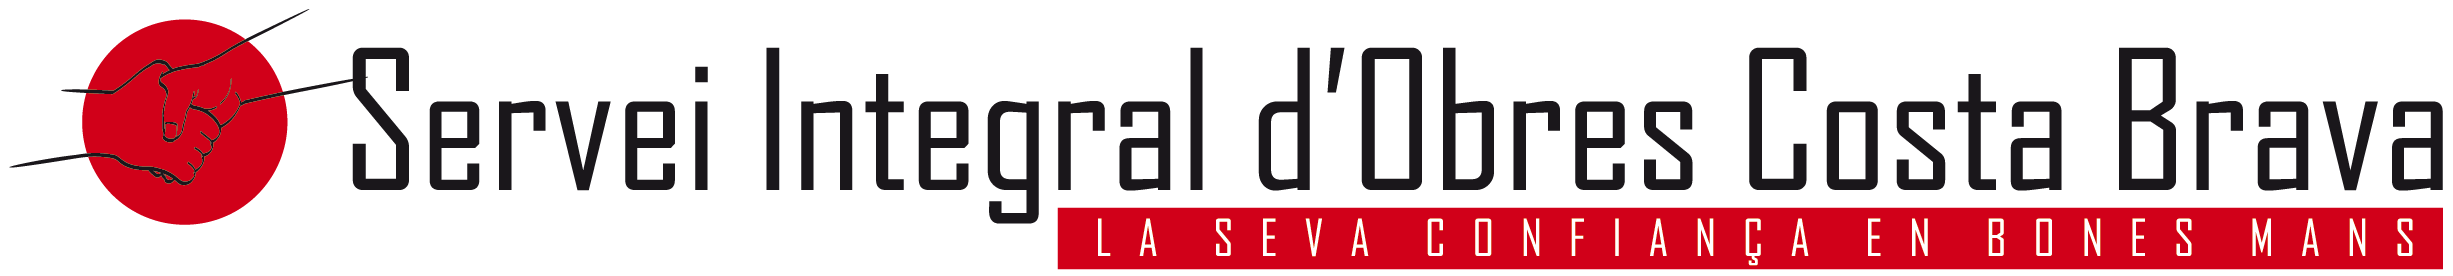 Servei Integral d'Obres Costa Brava